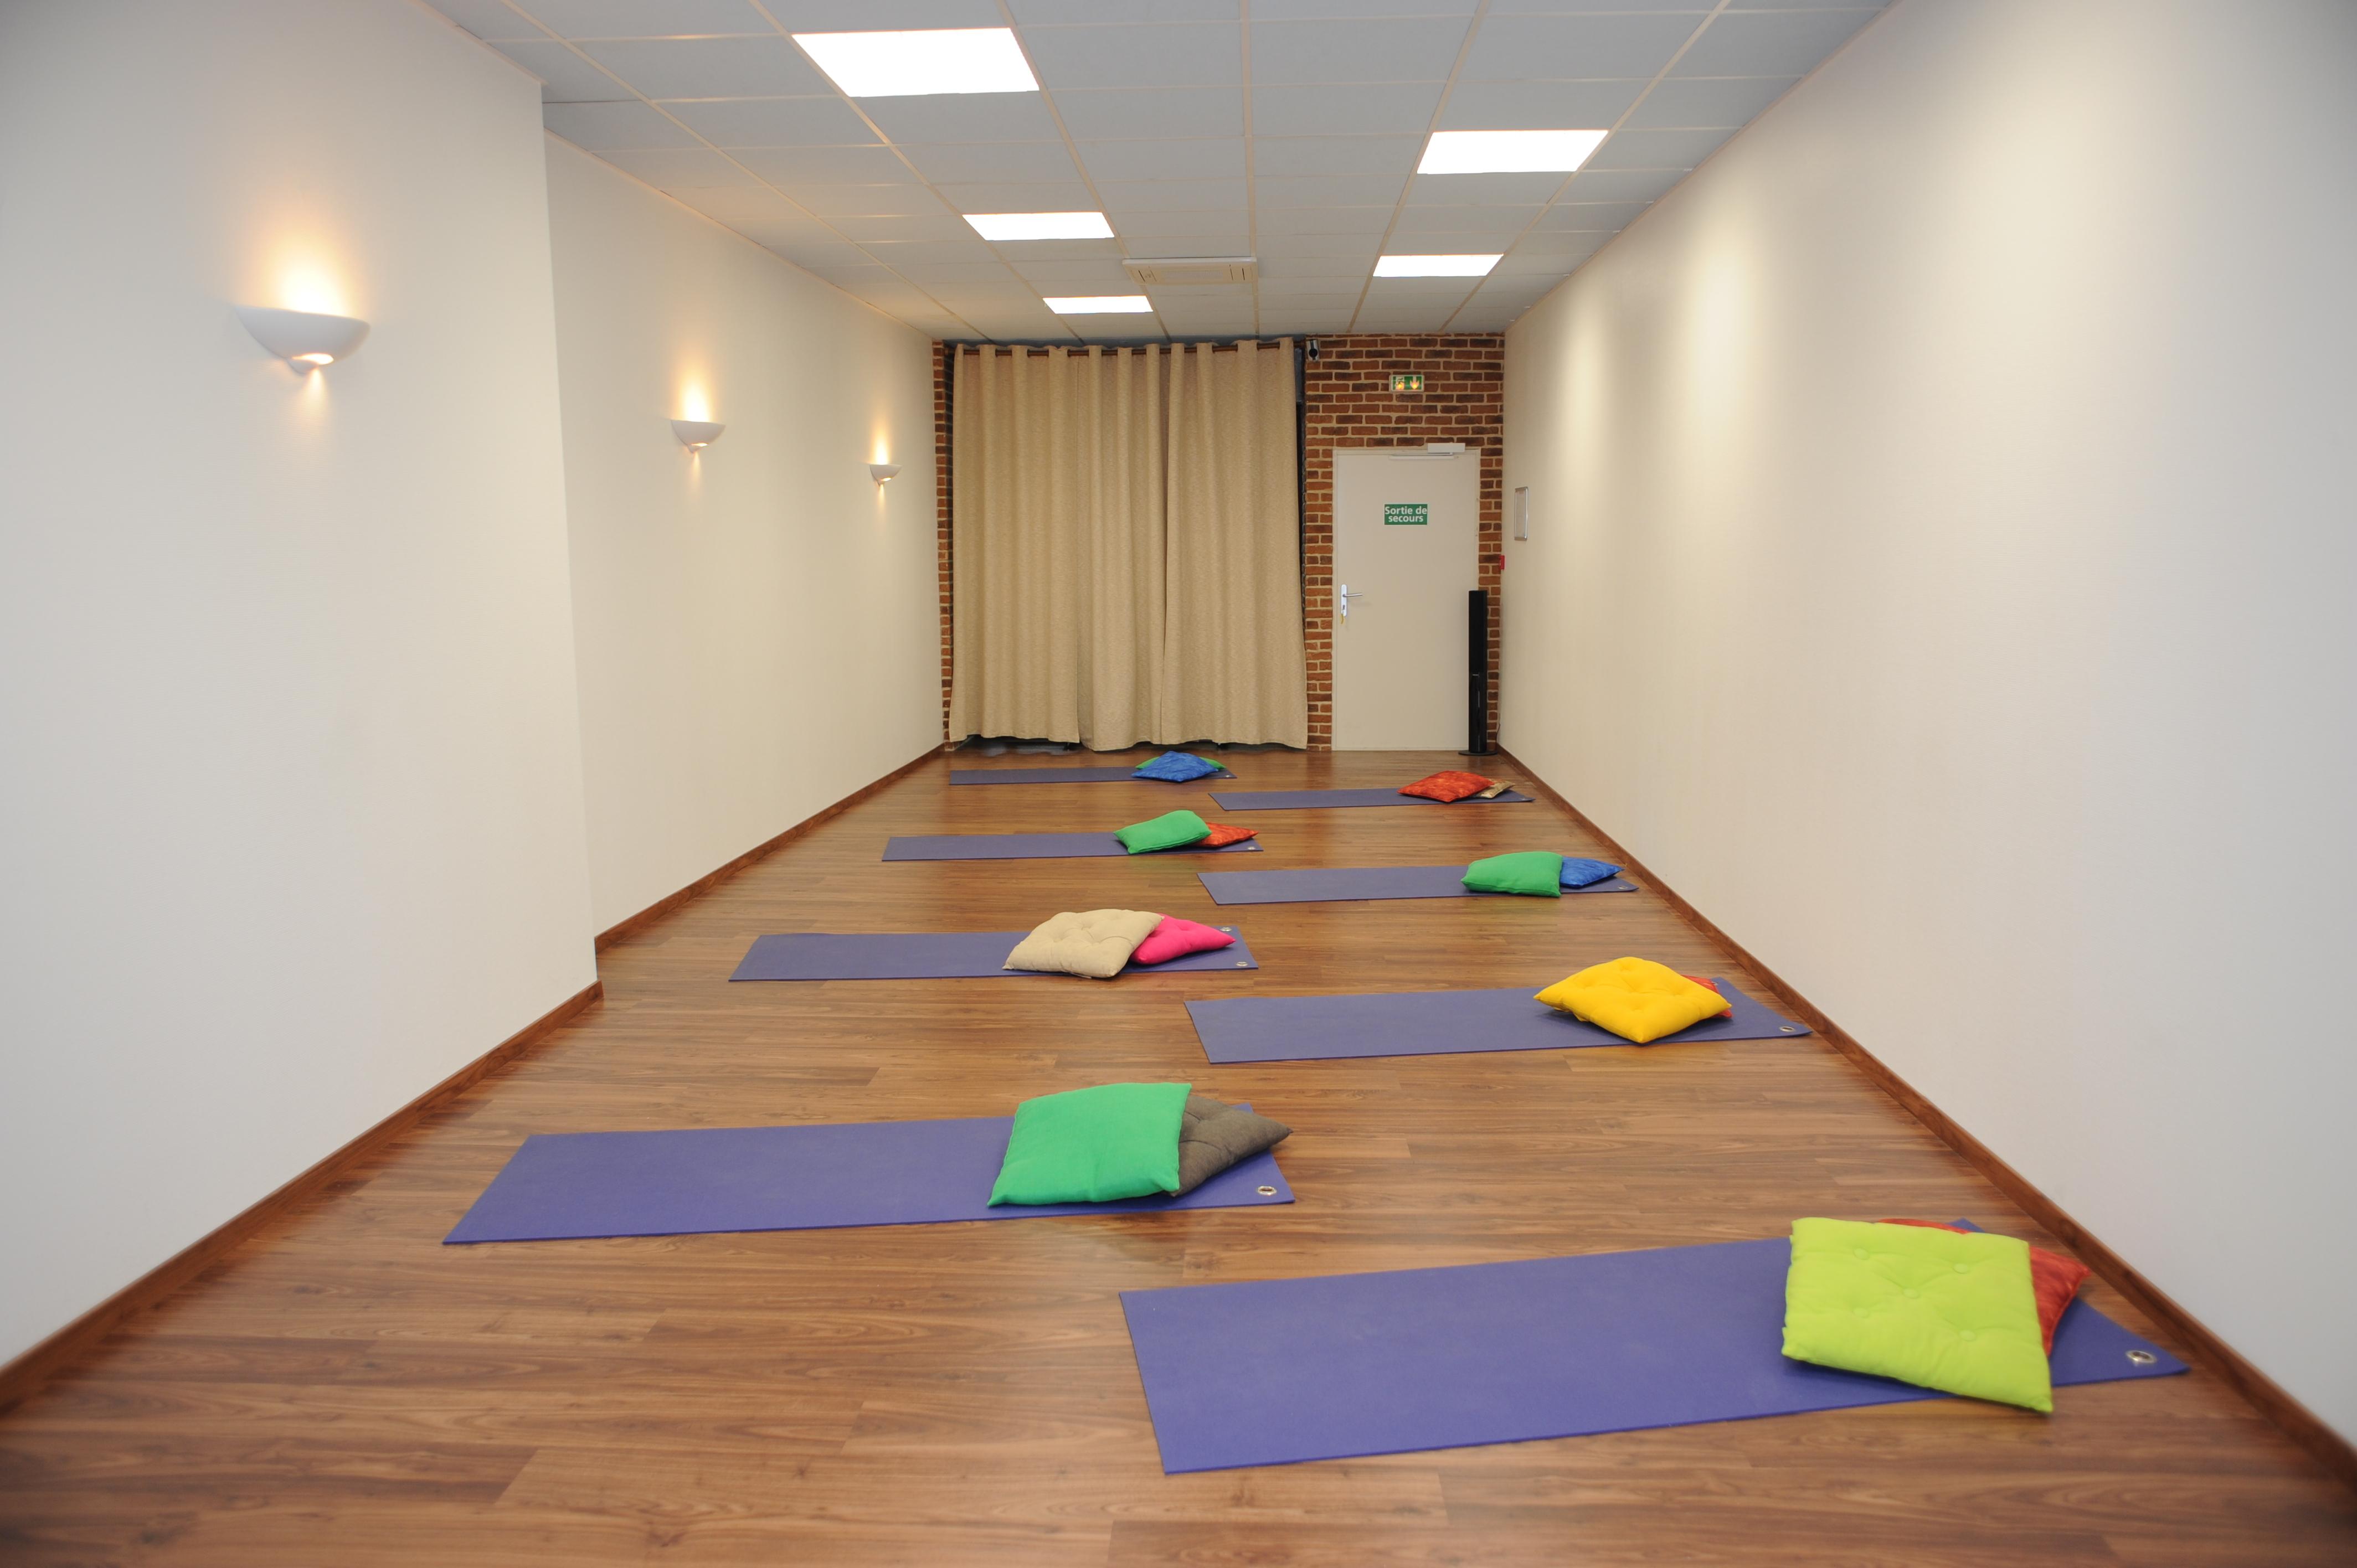 Salle de yoga relaxation m ditation marseille 01 13001 for Salle de relaxation